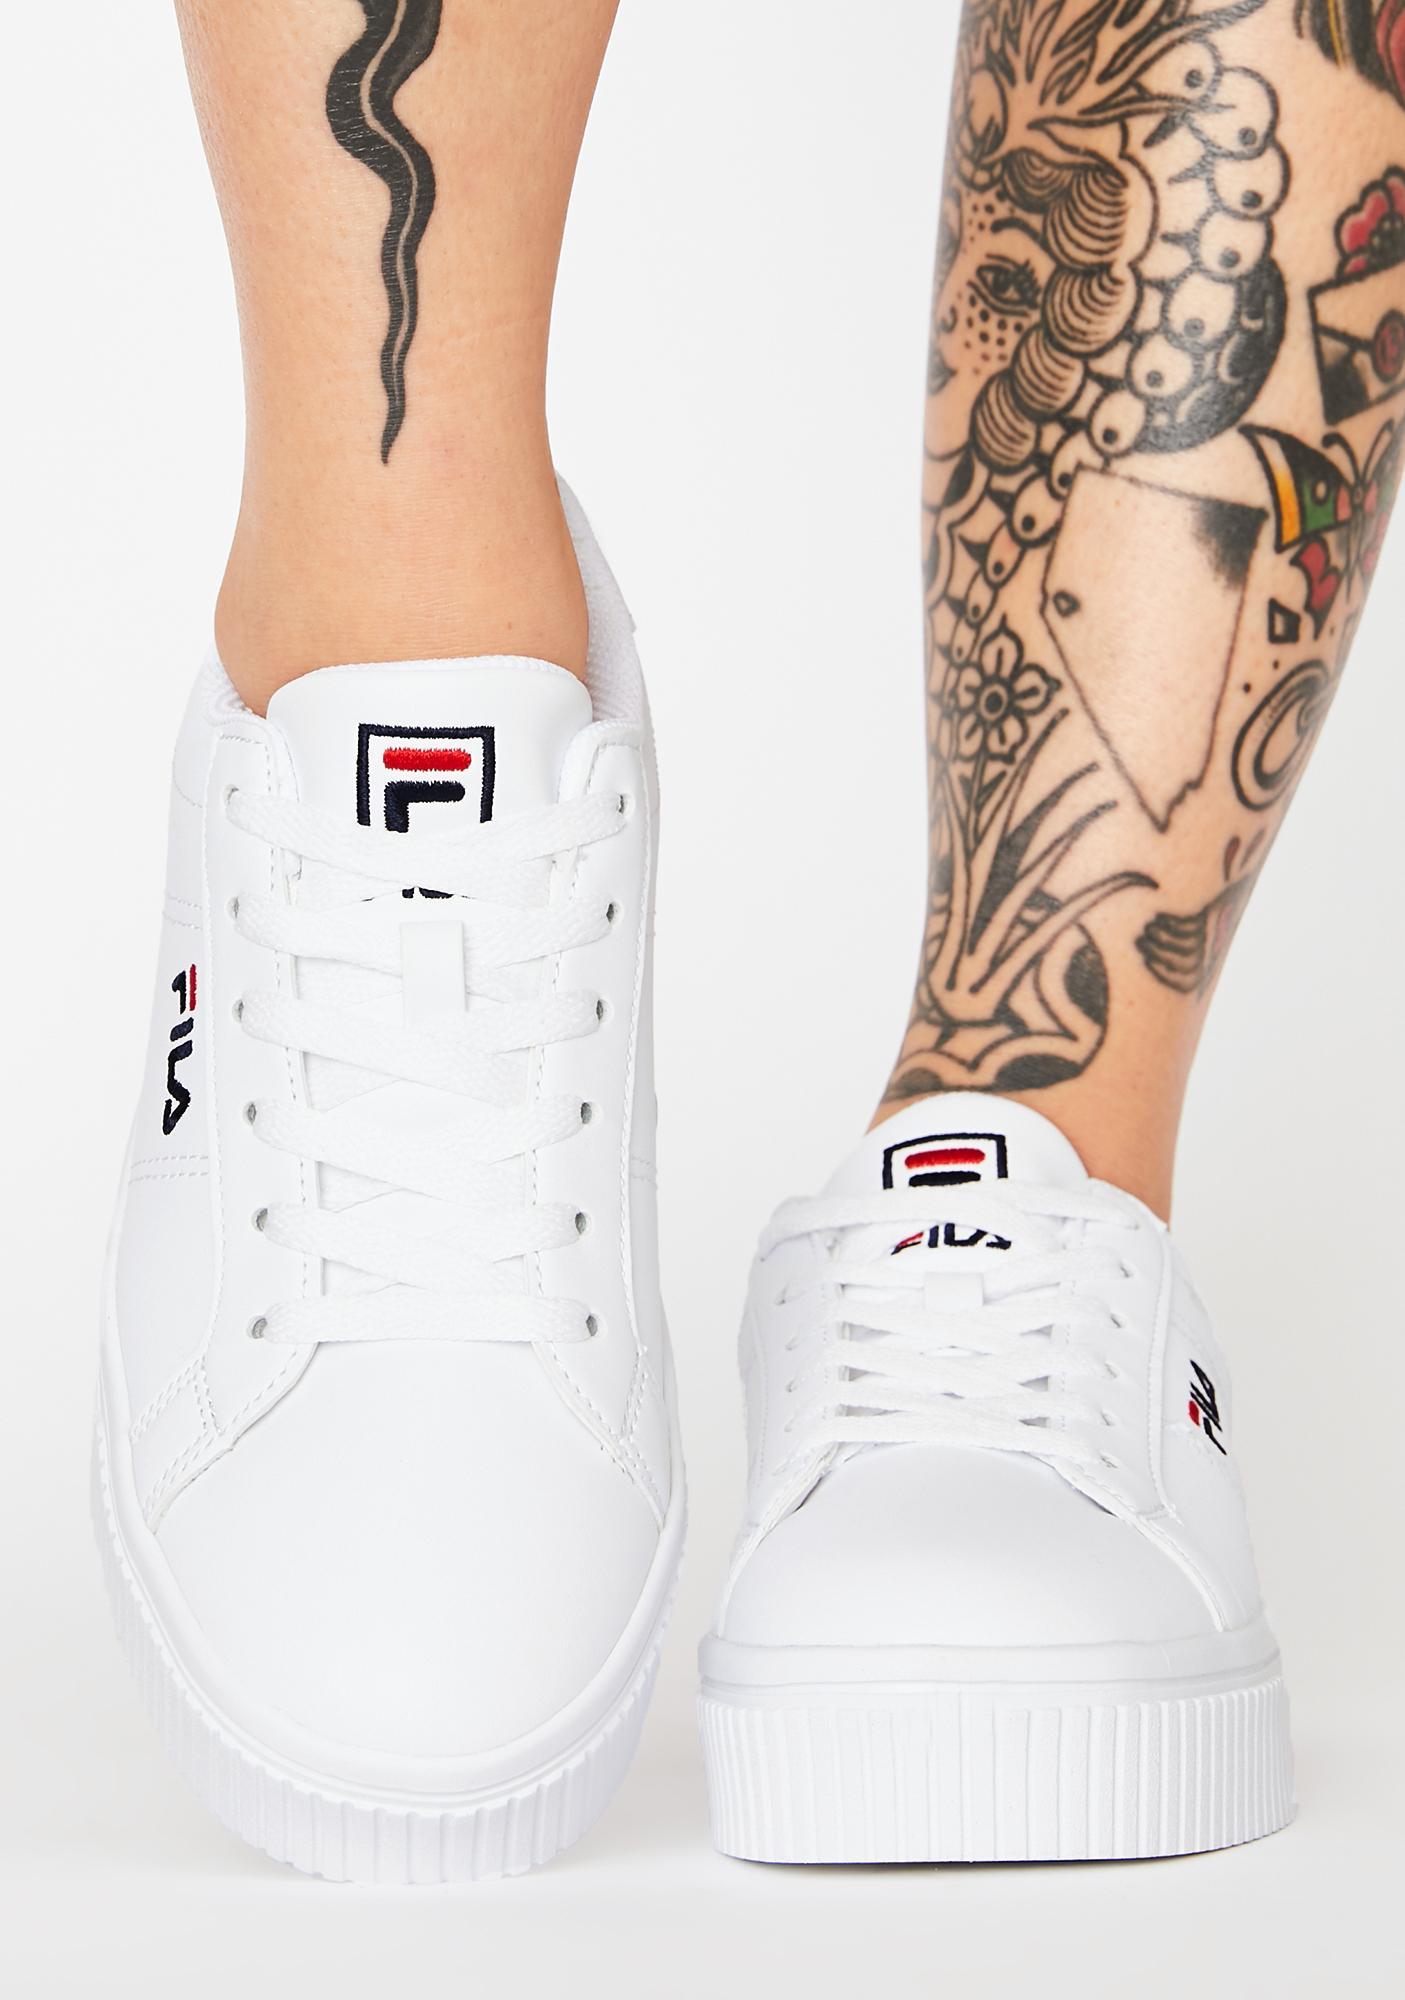 Fila Panache 19 Classic Sneakers